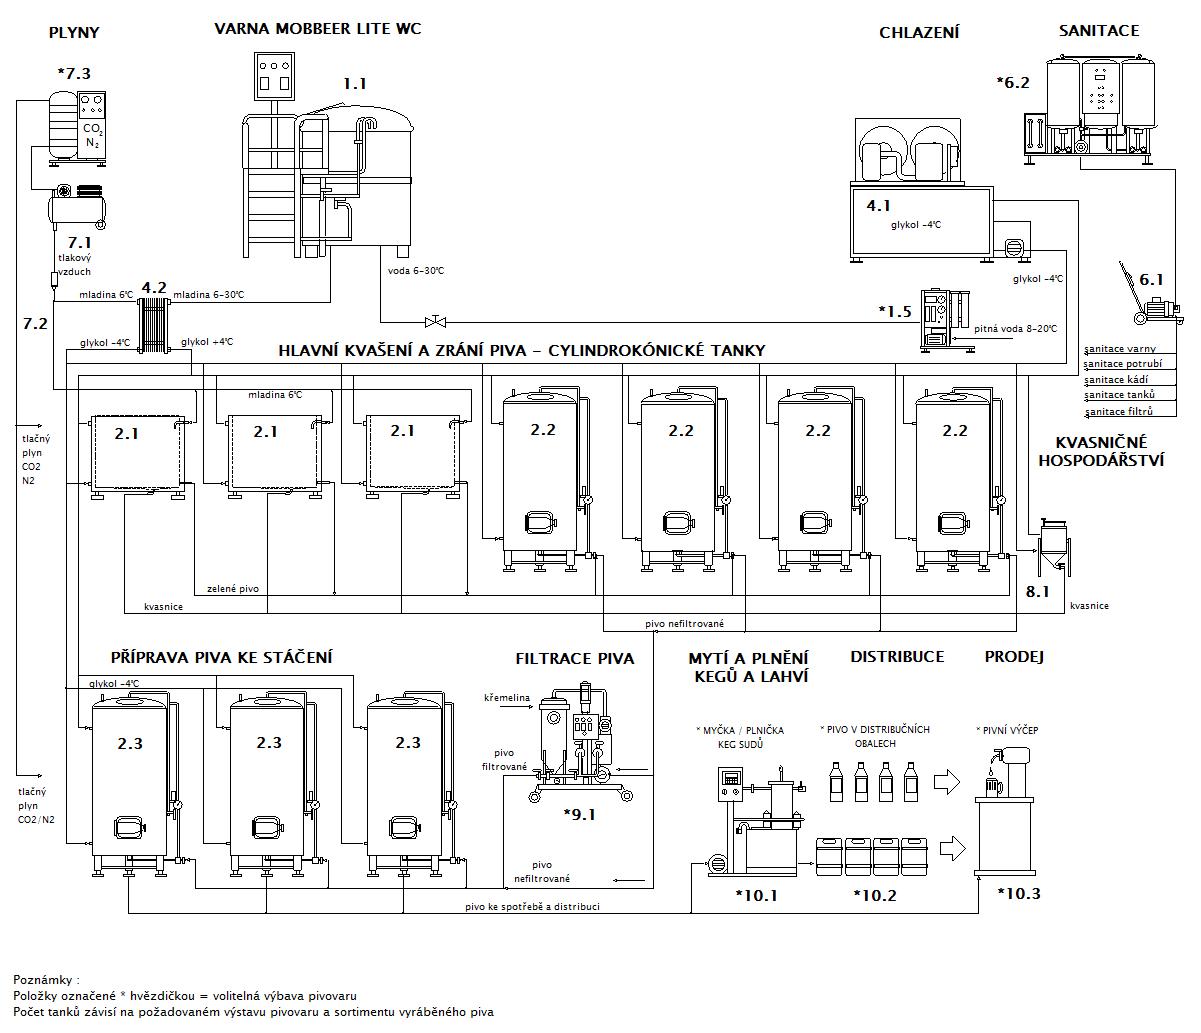 Blokové schéma minipivovaru MOBBEER LITE WC OF